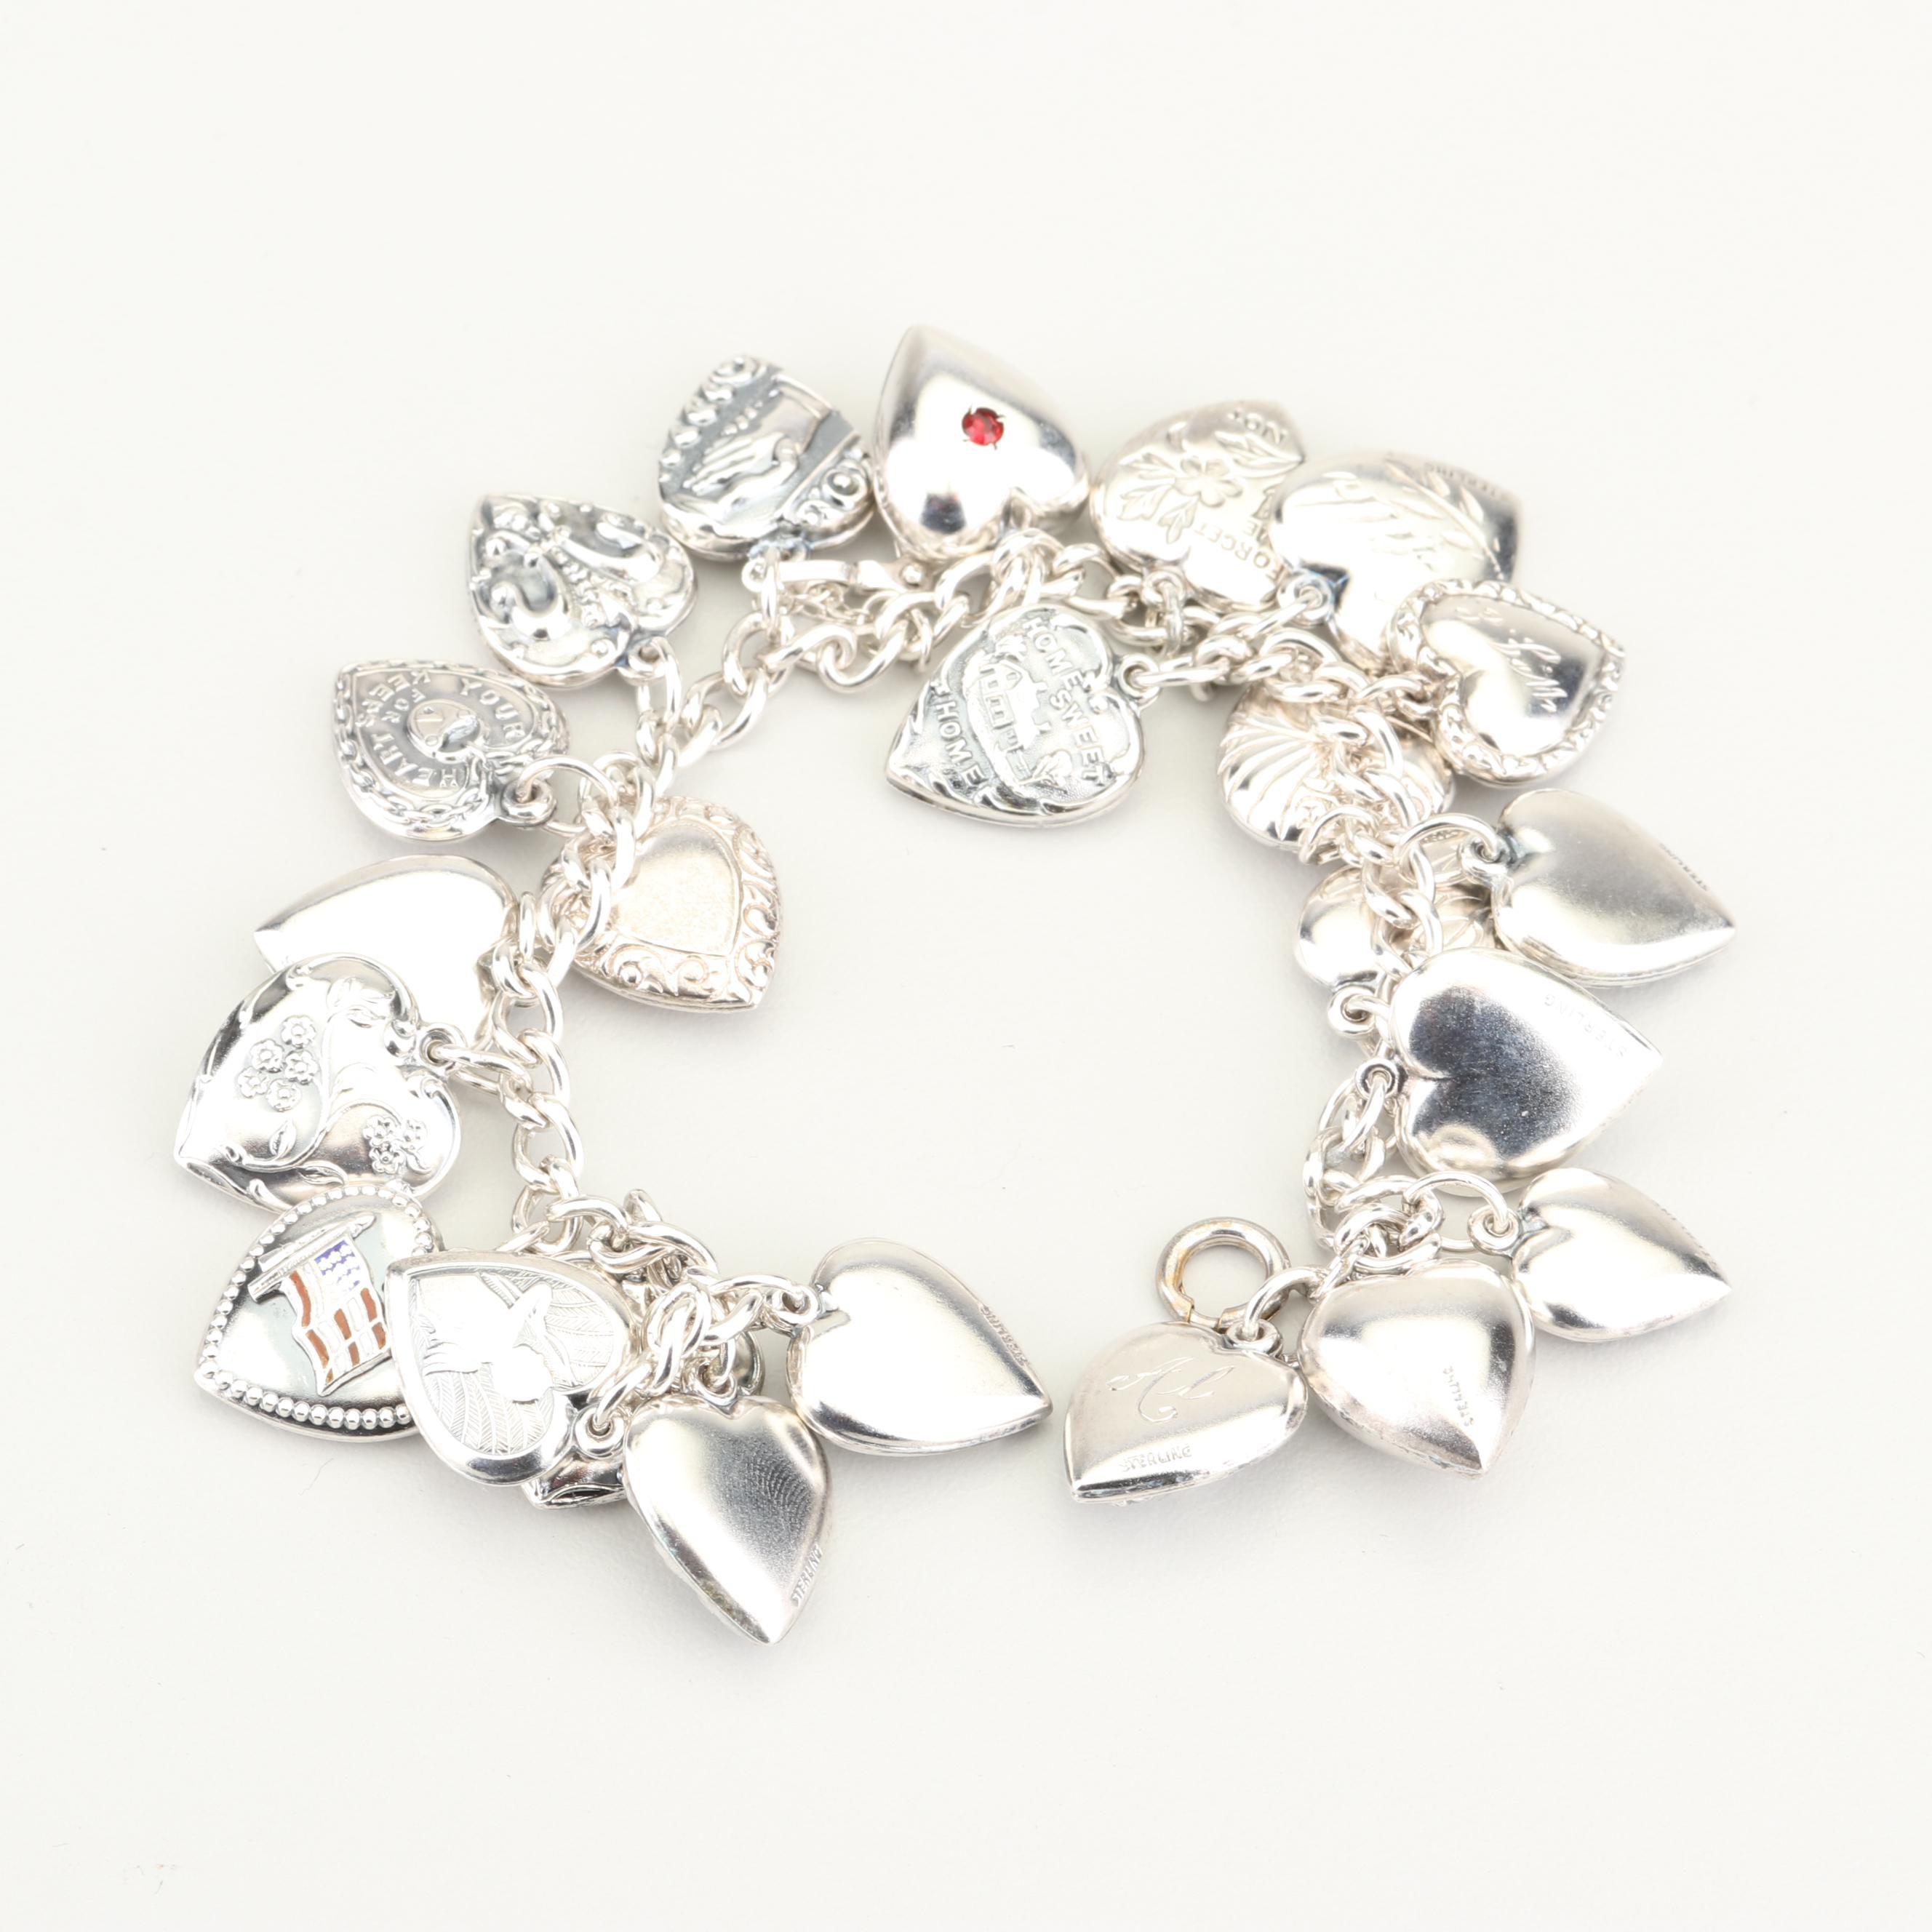 Sterling Silver Initials Charm Bracelet